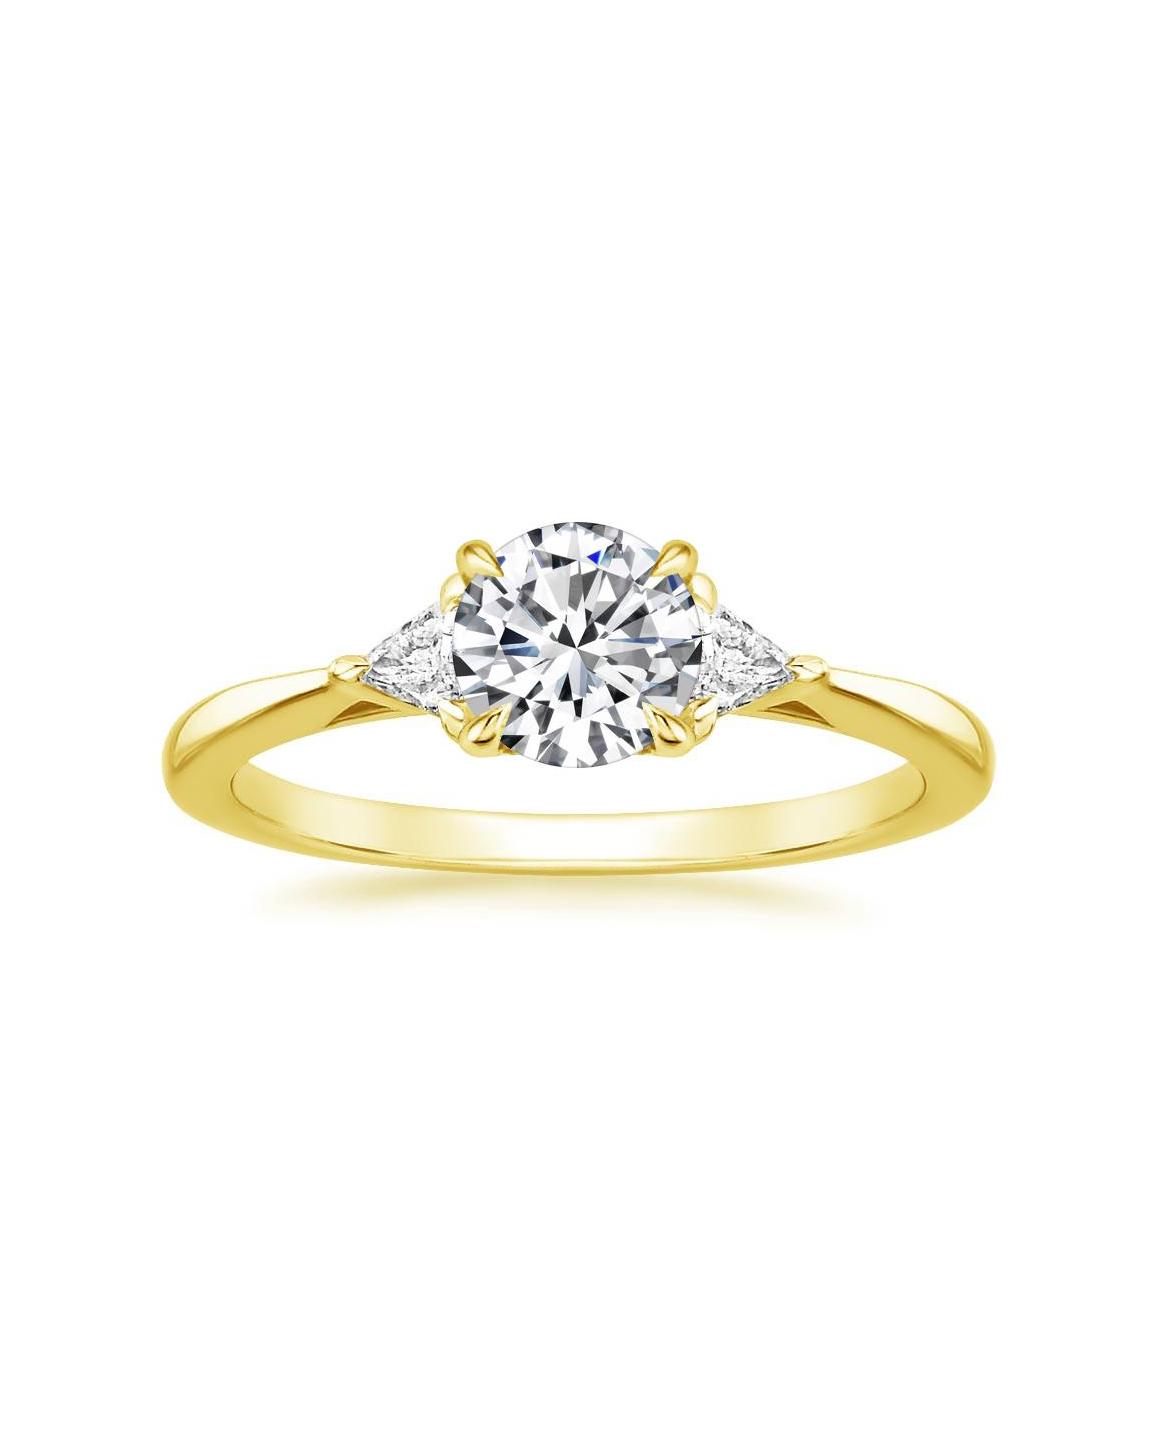 18K Yellow Gold Esprit Diamond Ring